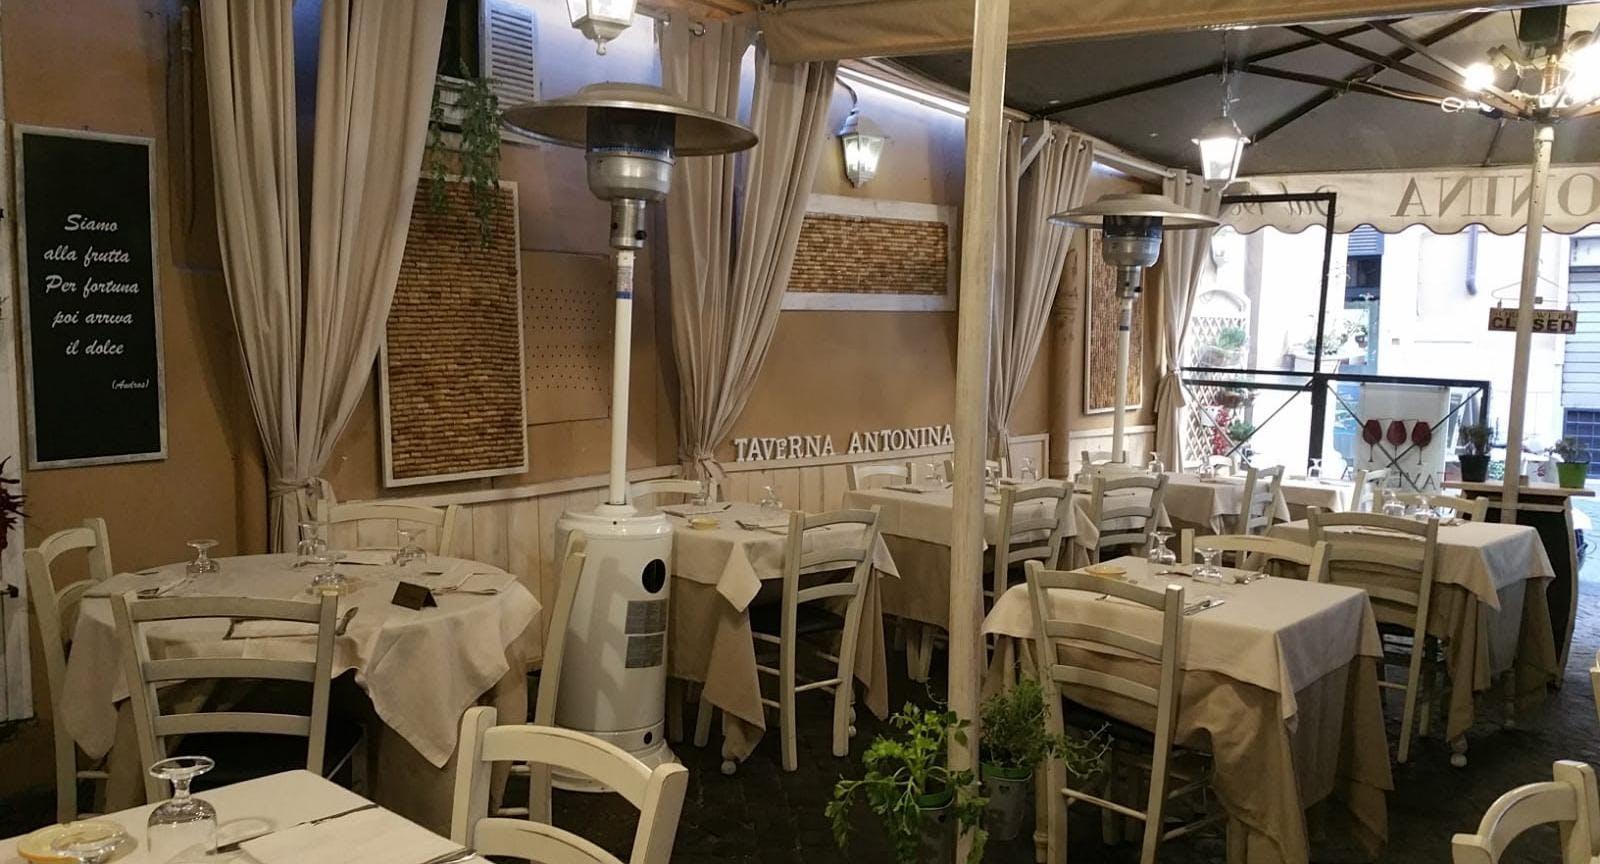 Taverna Antonina dal 1939 Rom image 3